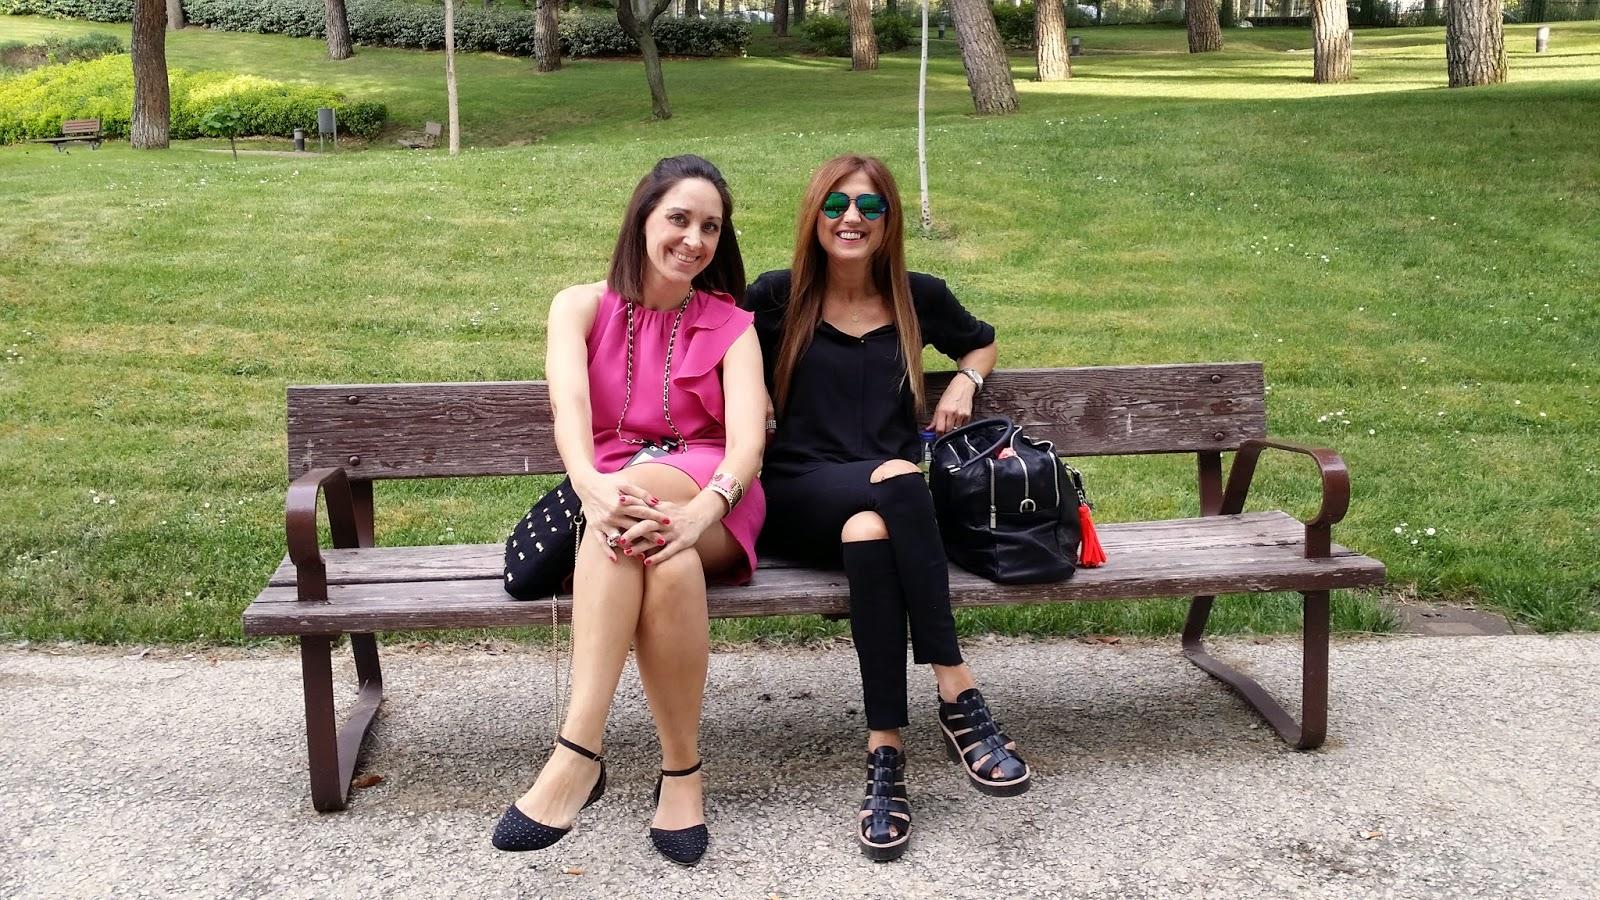 Museo del Traje, IV Jornadas Blogs de Moda, Street Style, Fashion Bloggers, Madrid, Evento Moda, Style, Carmen Hummer